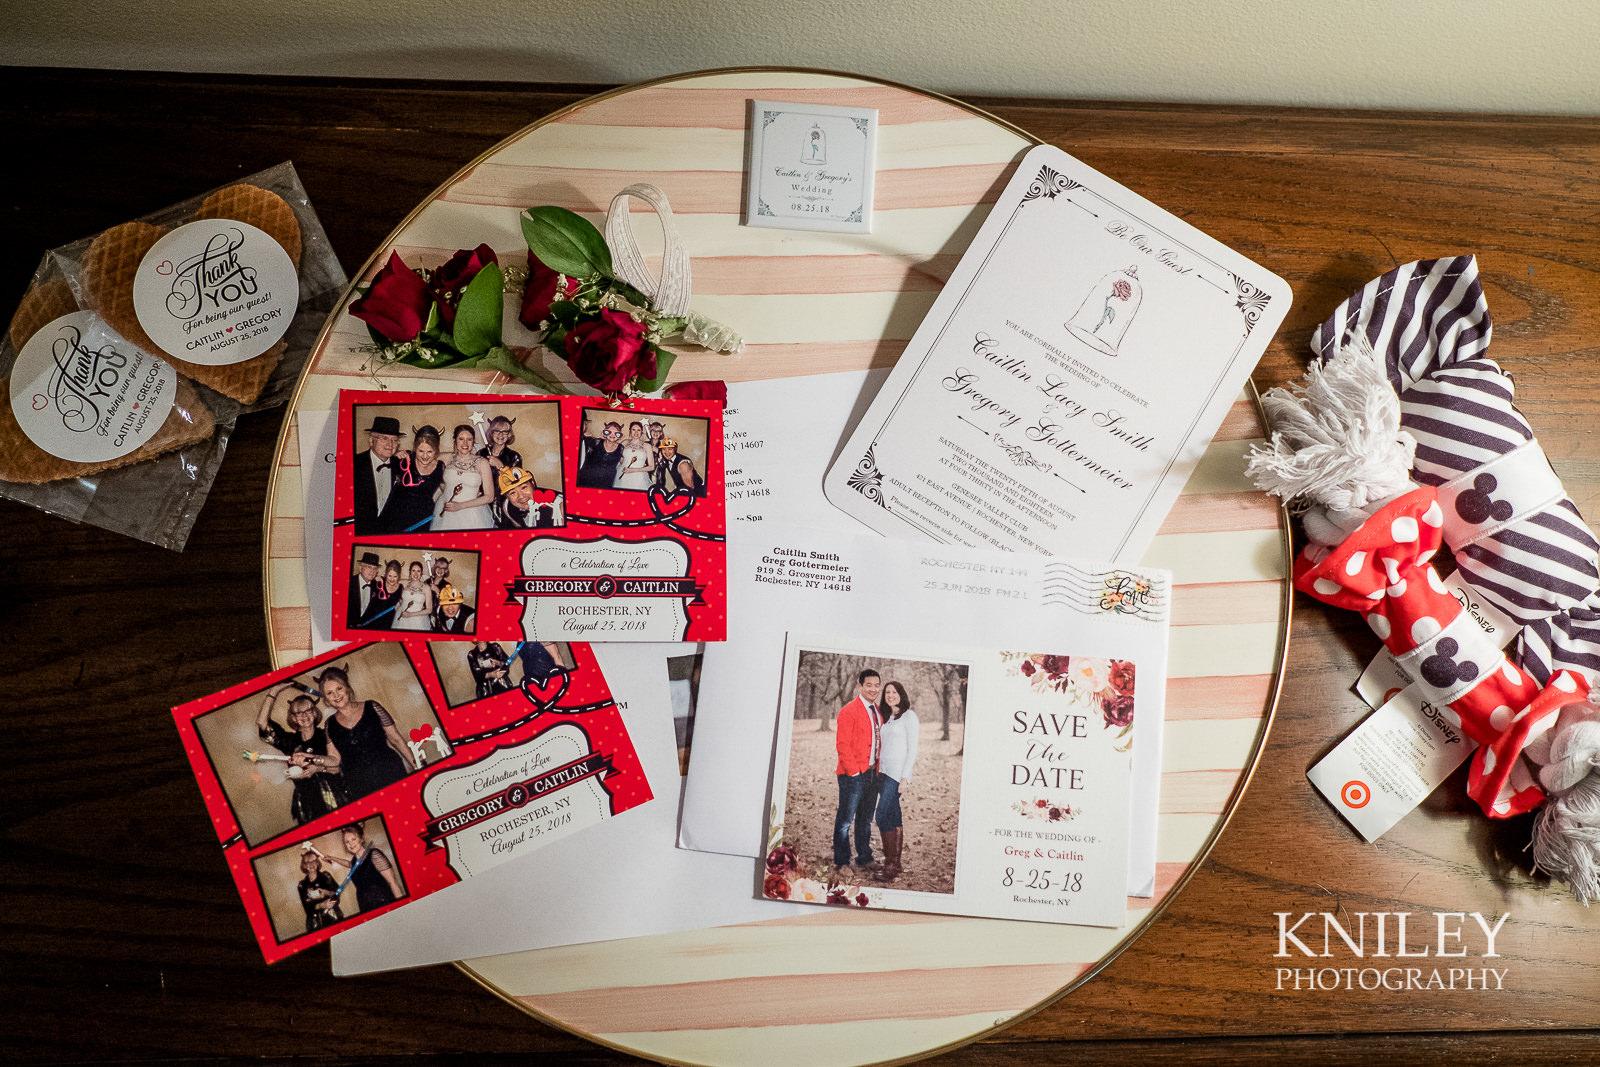 179 - Family brunch after wedding - Rochester NY - XT2B7960.jpg